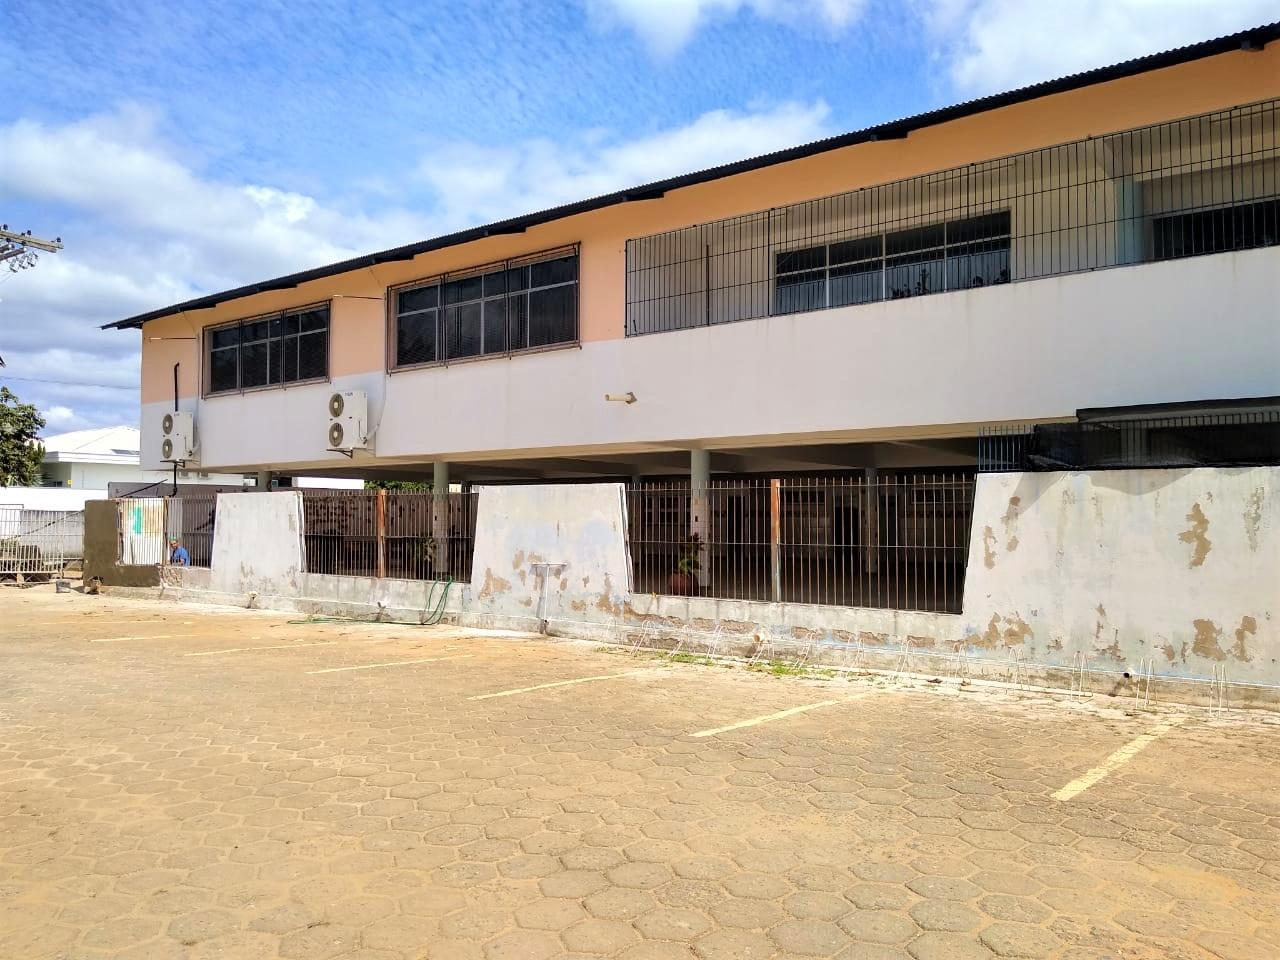 Município de Itarana reforma as escolas durante a pandemia do coronavírus (COVID-19)